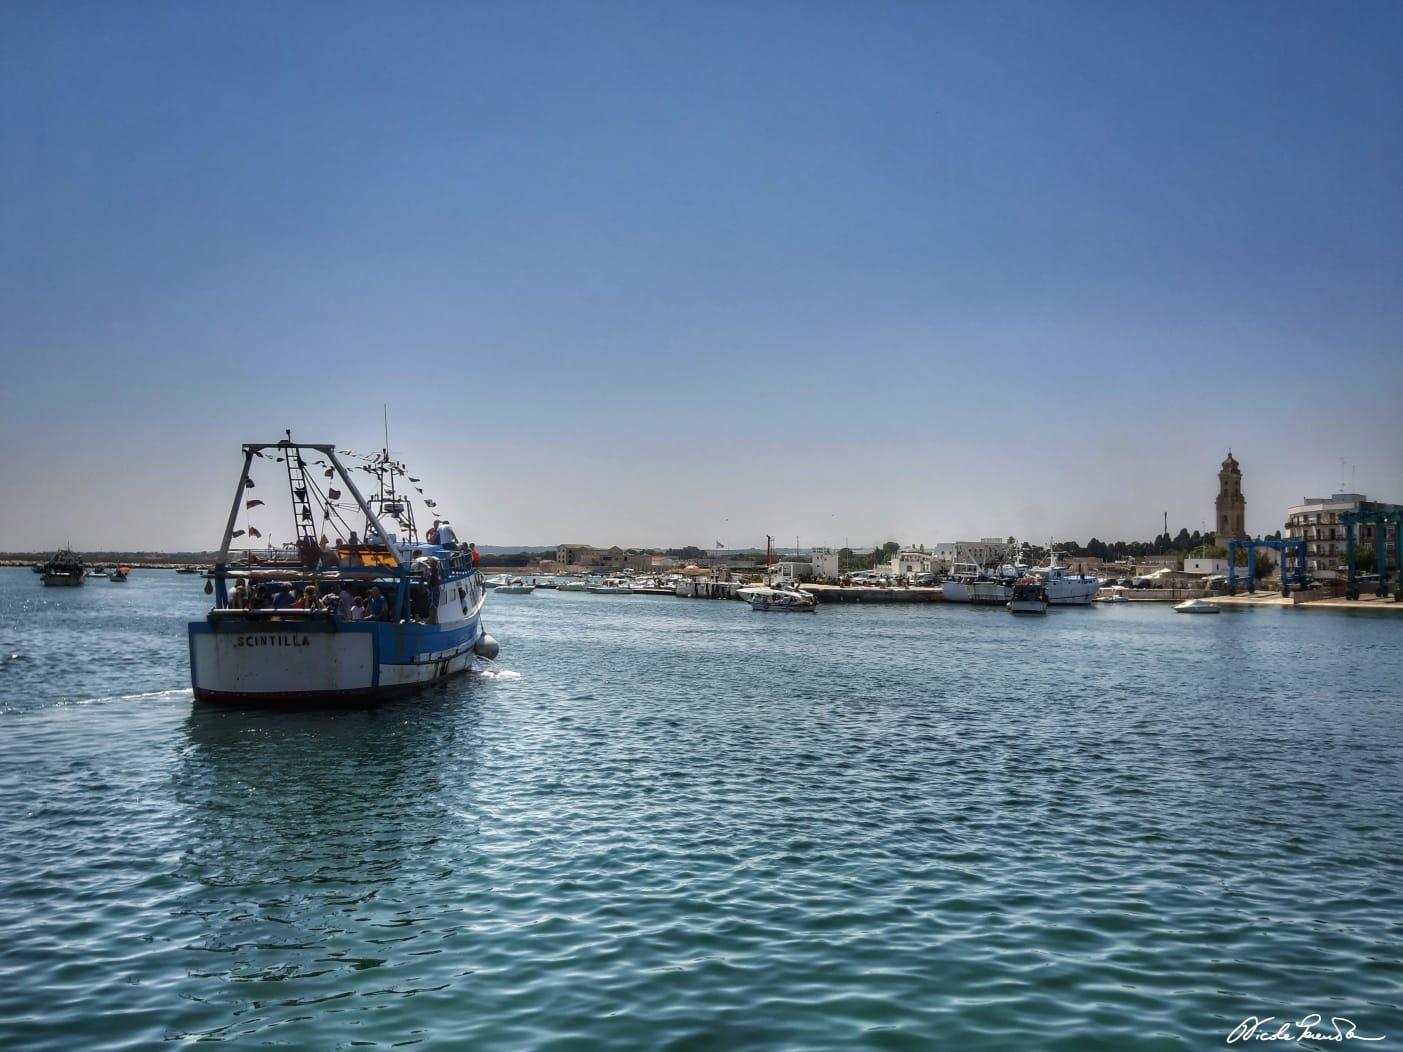 Visit Mola di Bari esperienza made in puglia